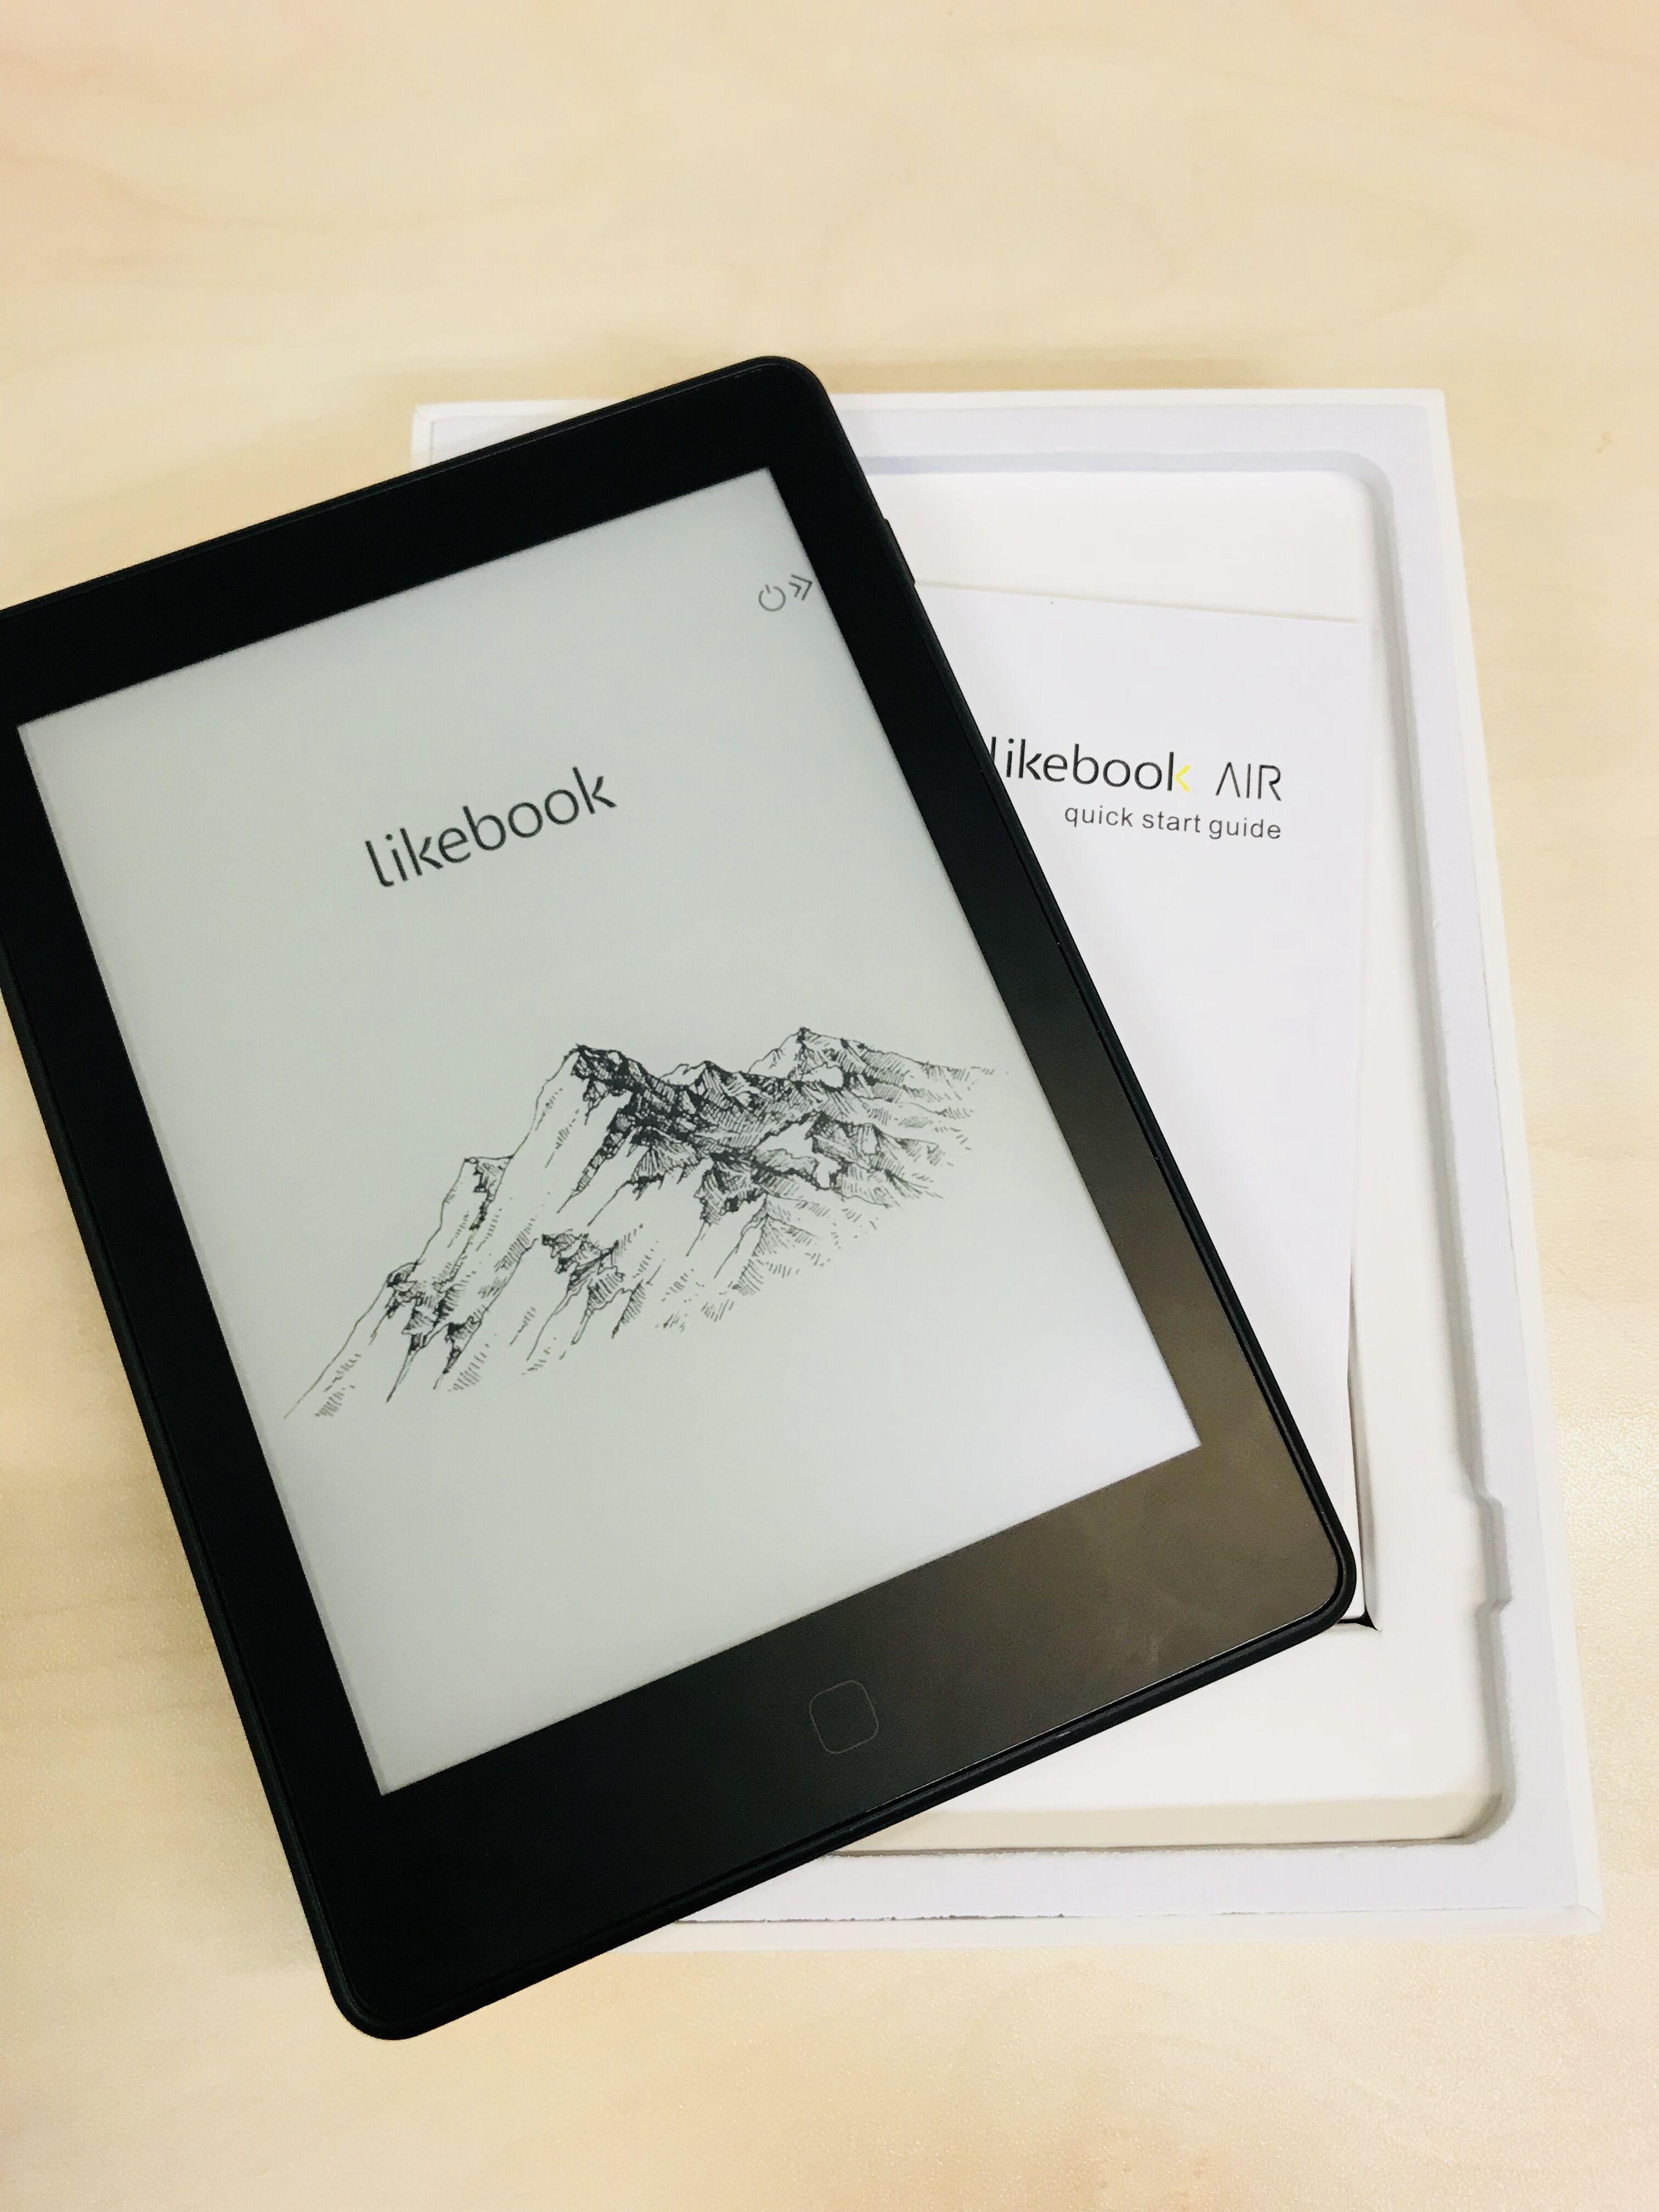 Likebook Air 6 전자 책 리더 1g 16g 300ppi 전자 잉크 카라 평면 유리 커버 렌즈 터치 스크린 프론트 라이트 및 프리 커버 포함 Ebook Reader Ebook Pocket Book